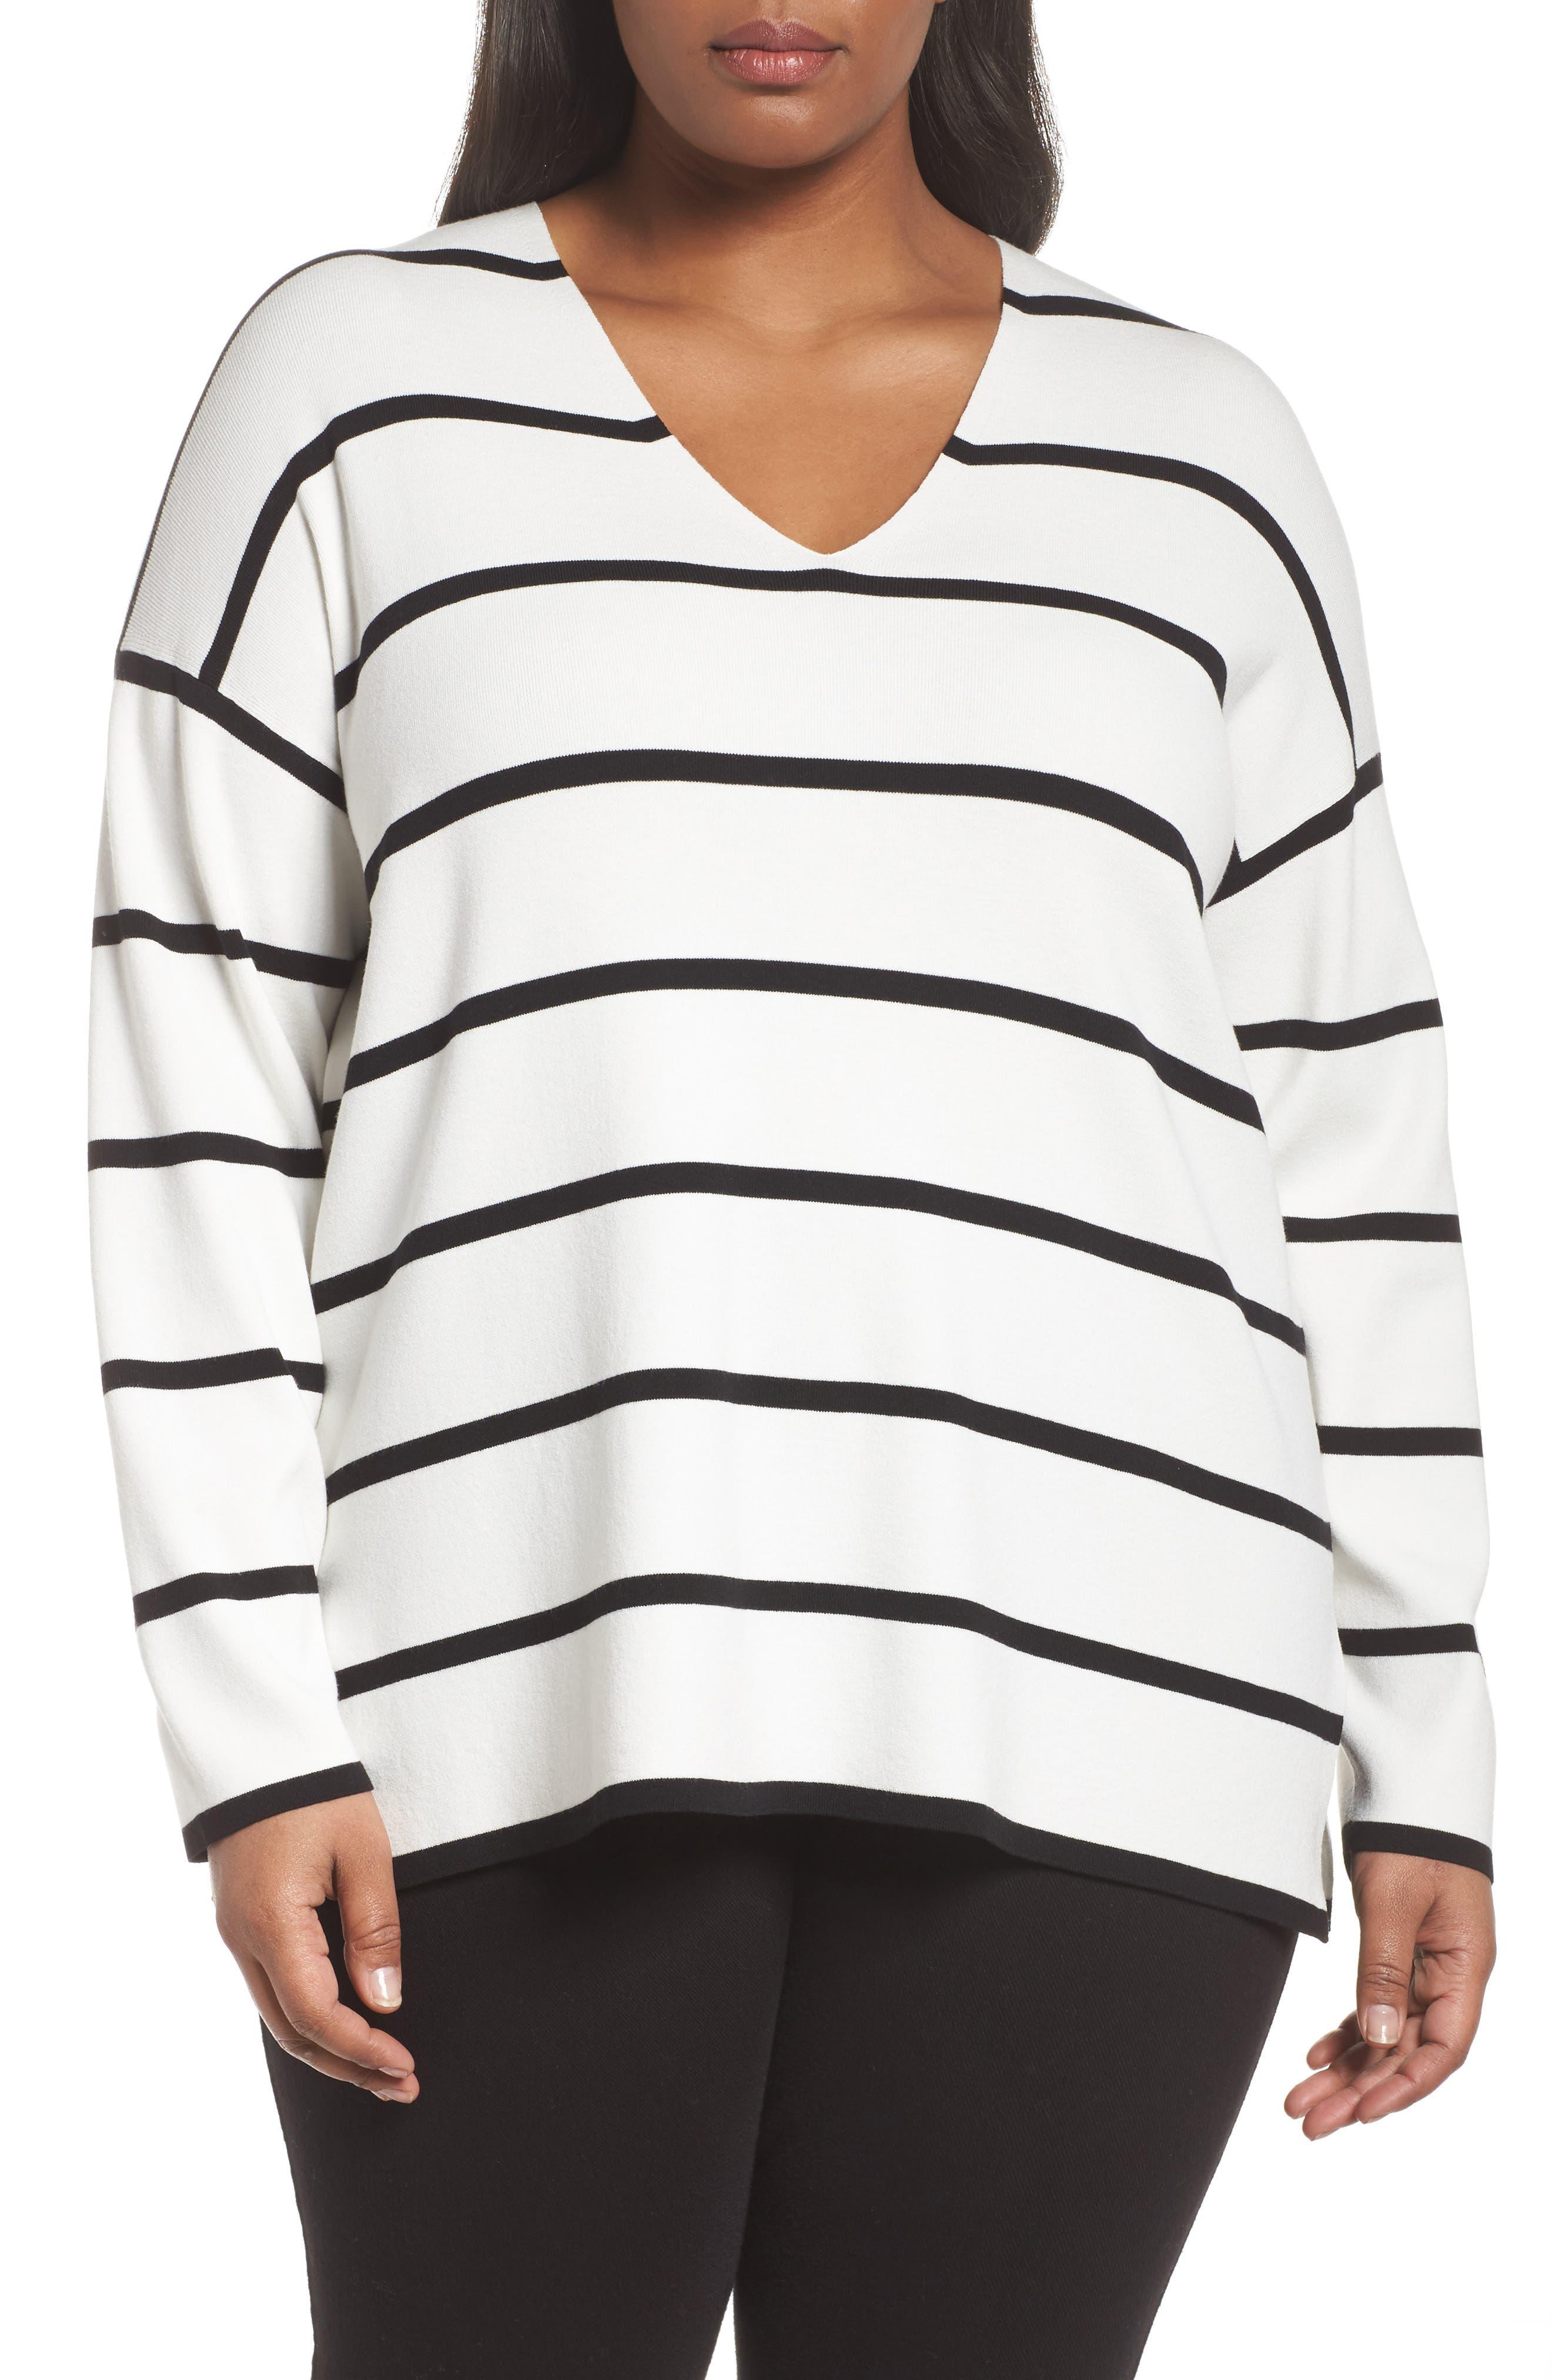 Alternate Image 1 Selected - Lafayette 148 New York Stripe Sweater (Plus Size)